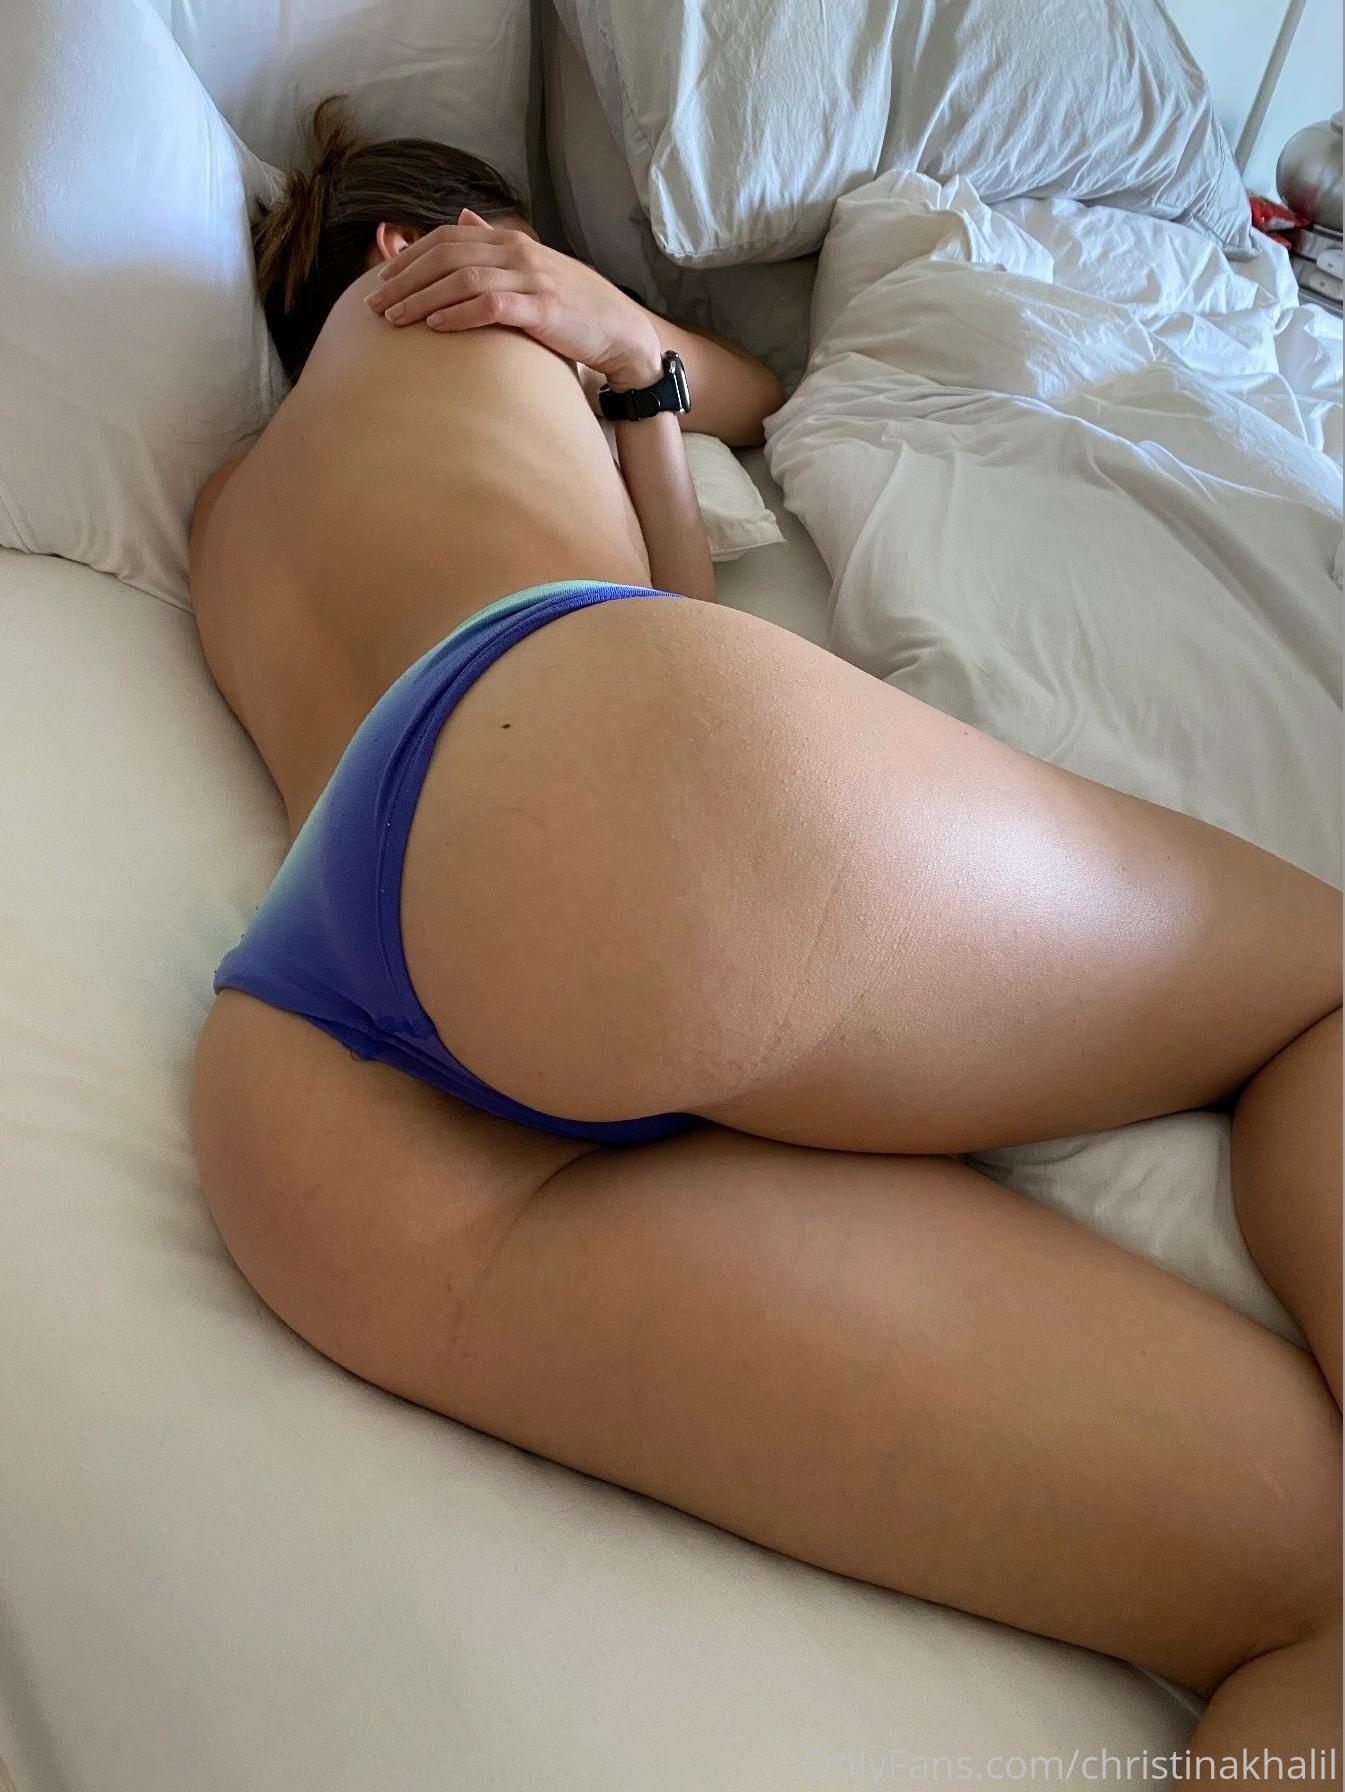 Christina Khalil See Through Lingerie Onlyfans Set Leaked Epinxd